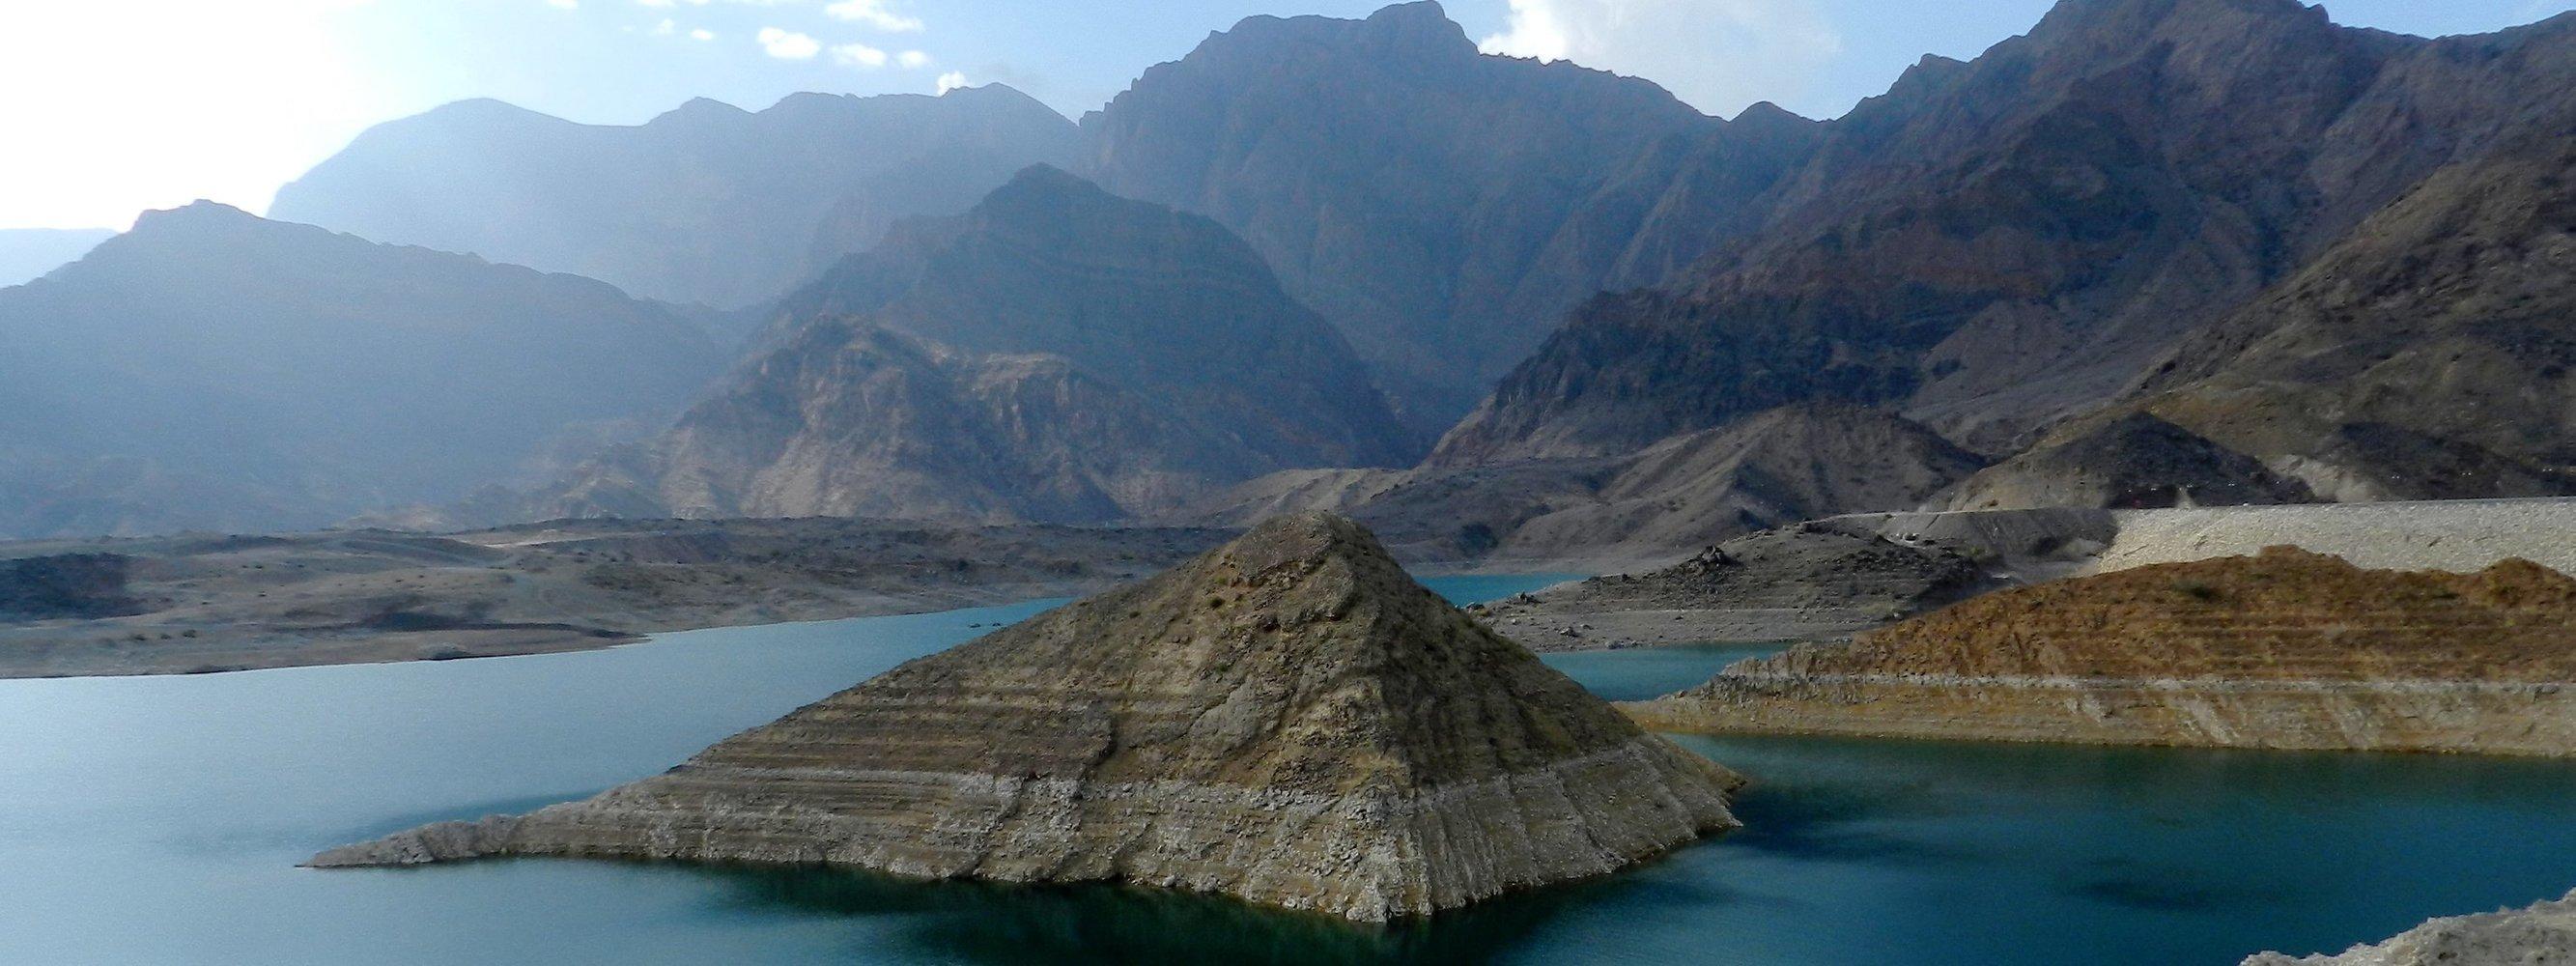 Oman Trips n' Tips